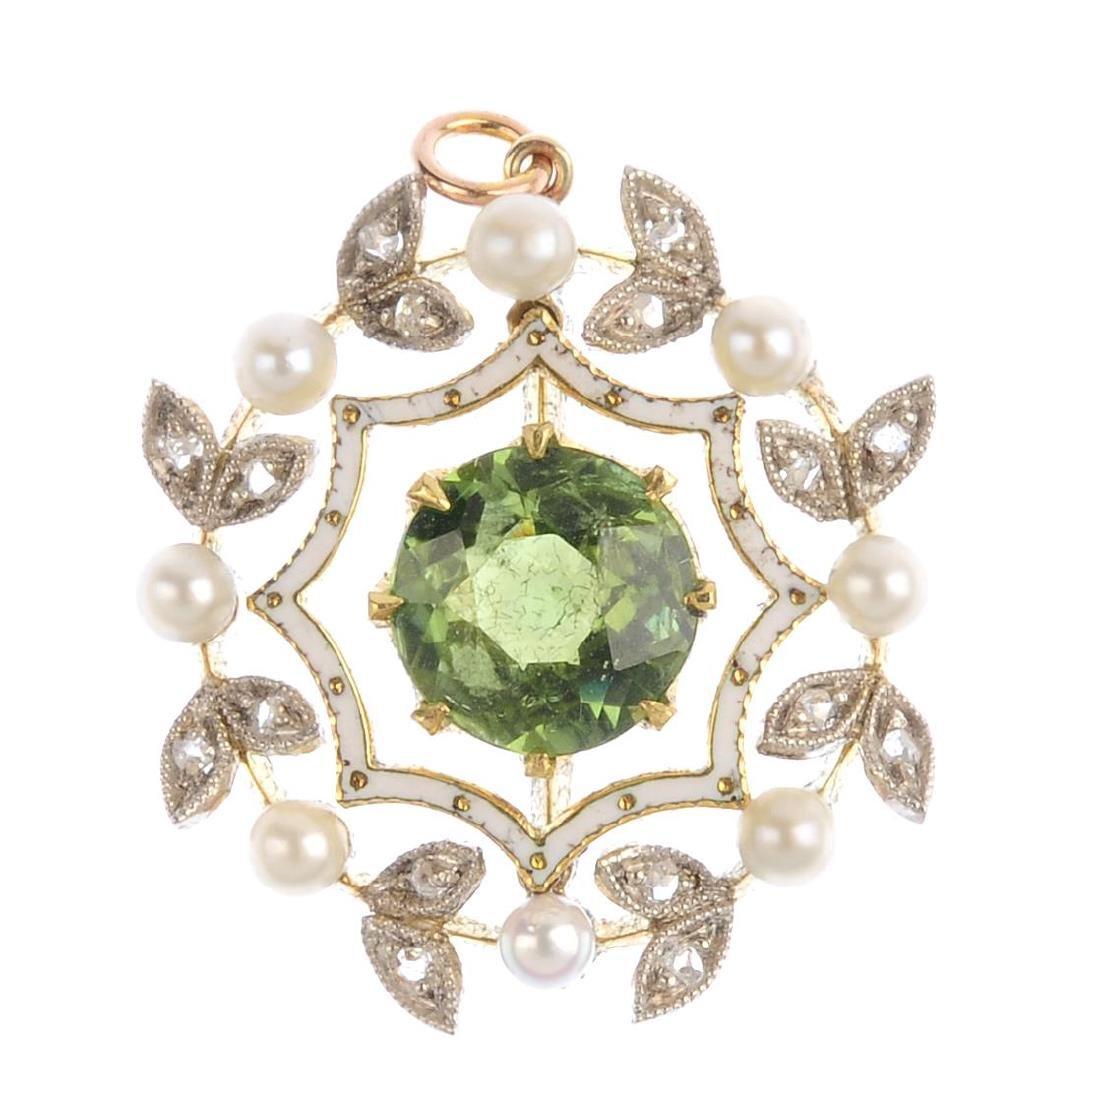 An early 20th century peridot, seed pearl and diamond